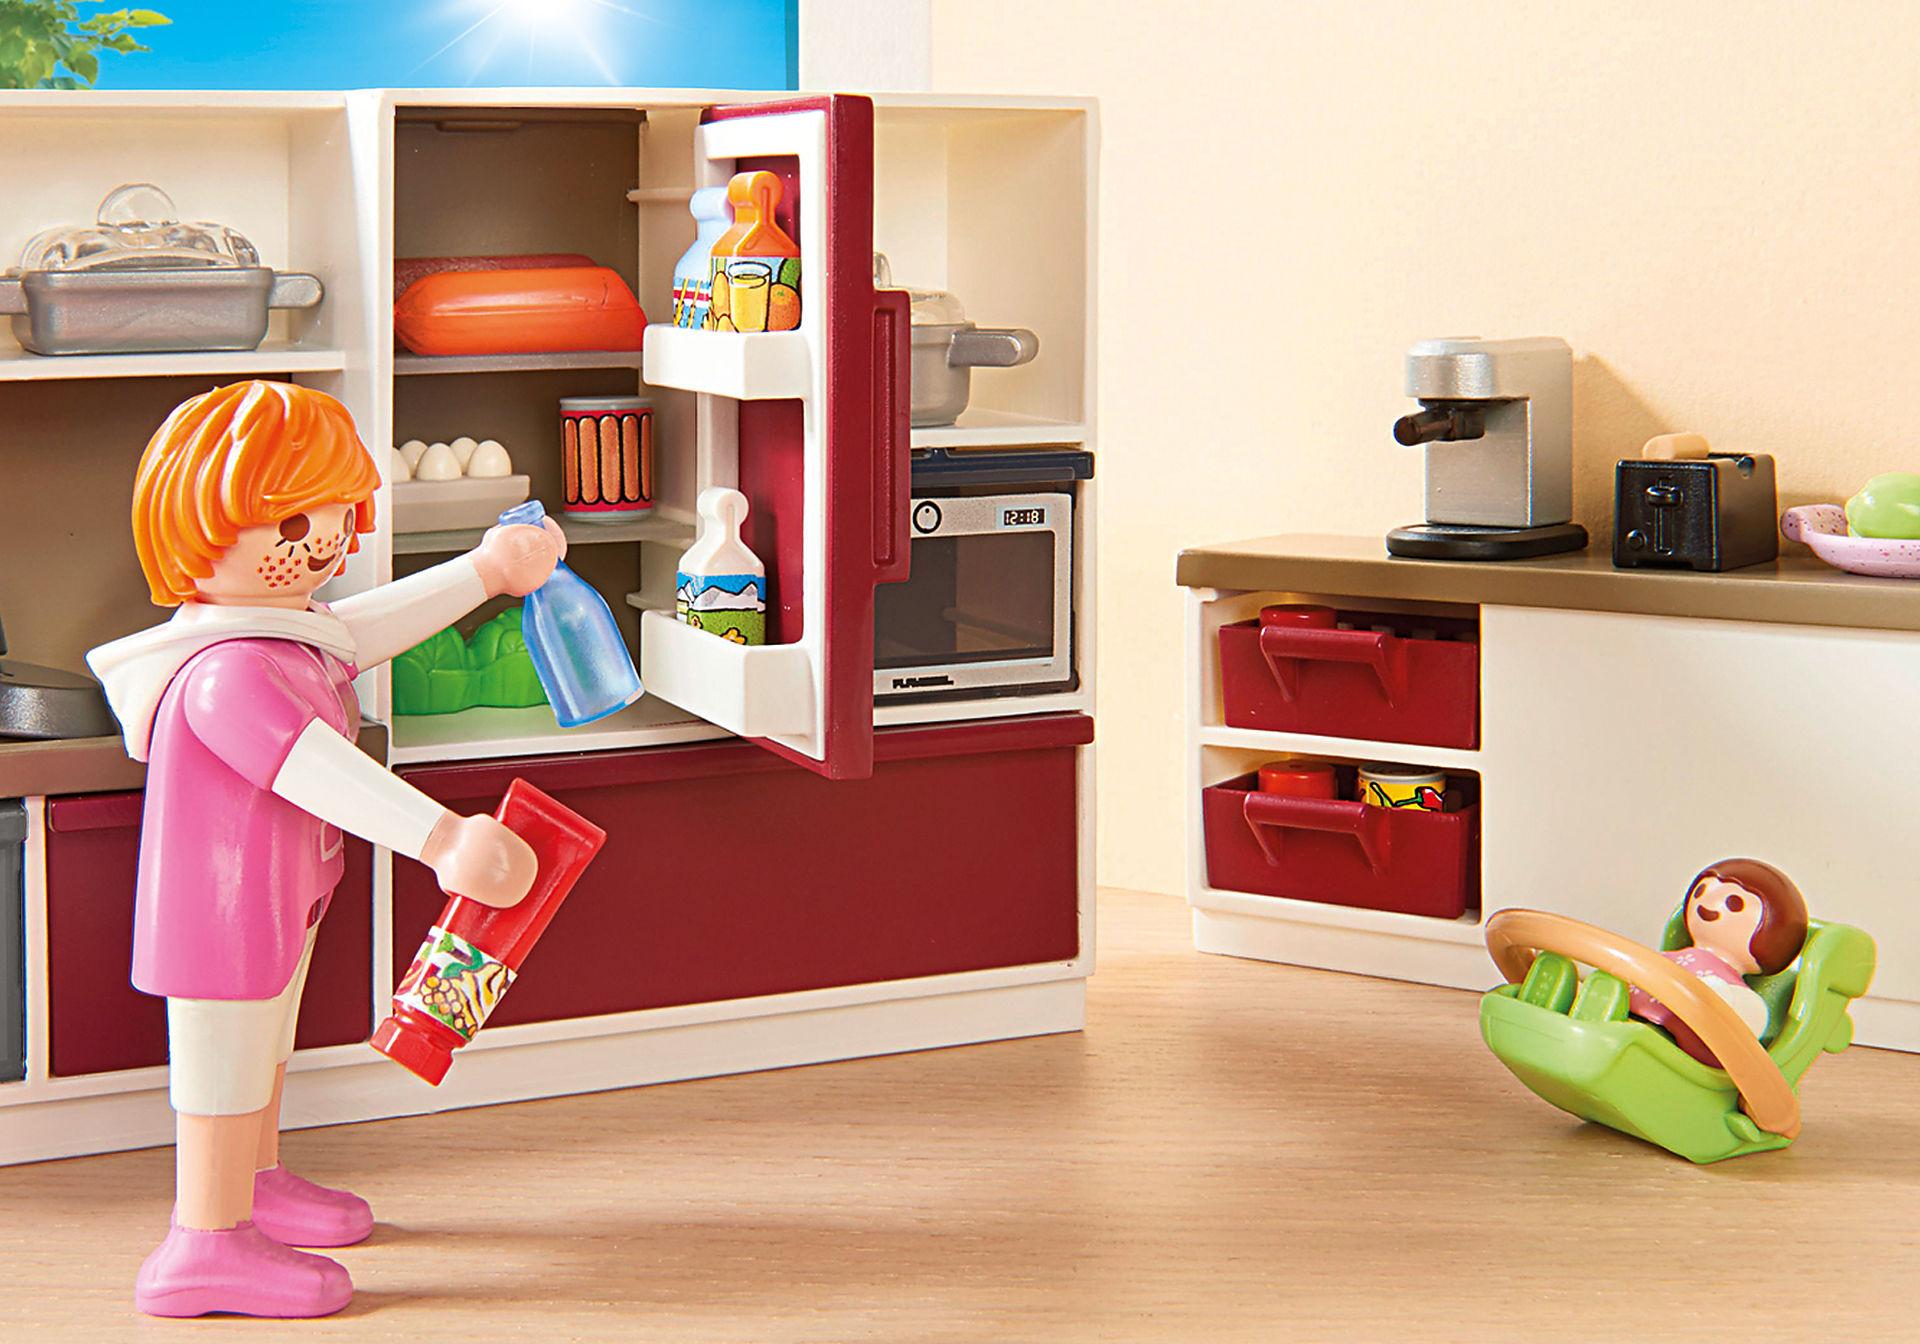 http://media.playmobil.com/i/playmobil/9269_product_extra3/Große Familienküche